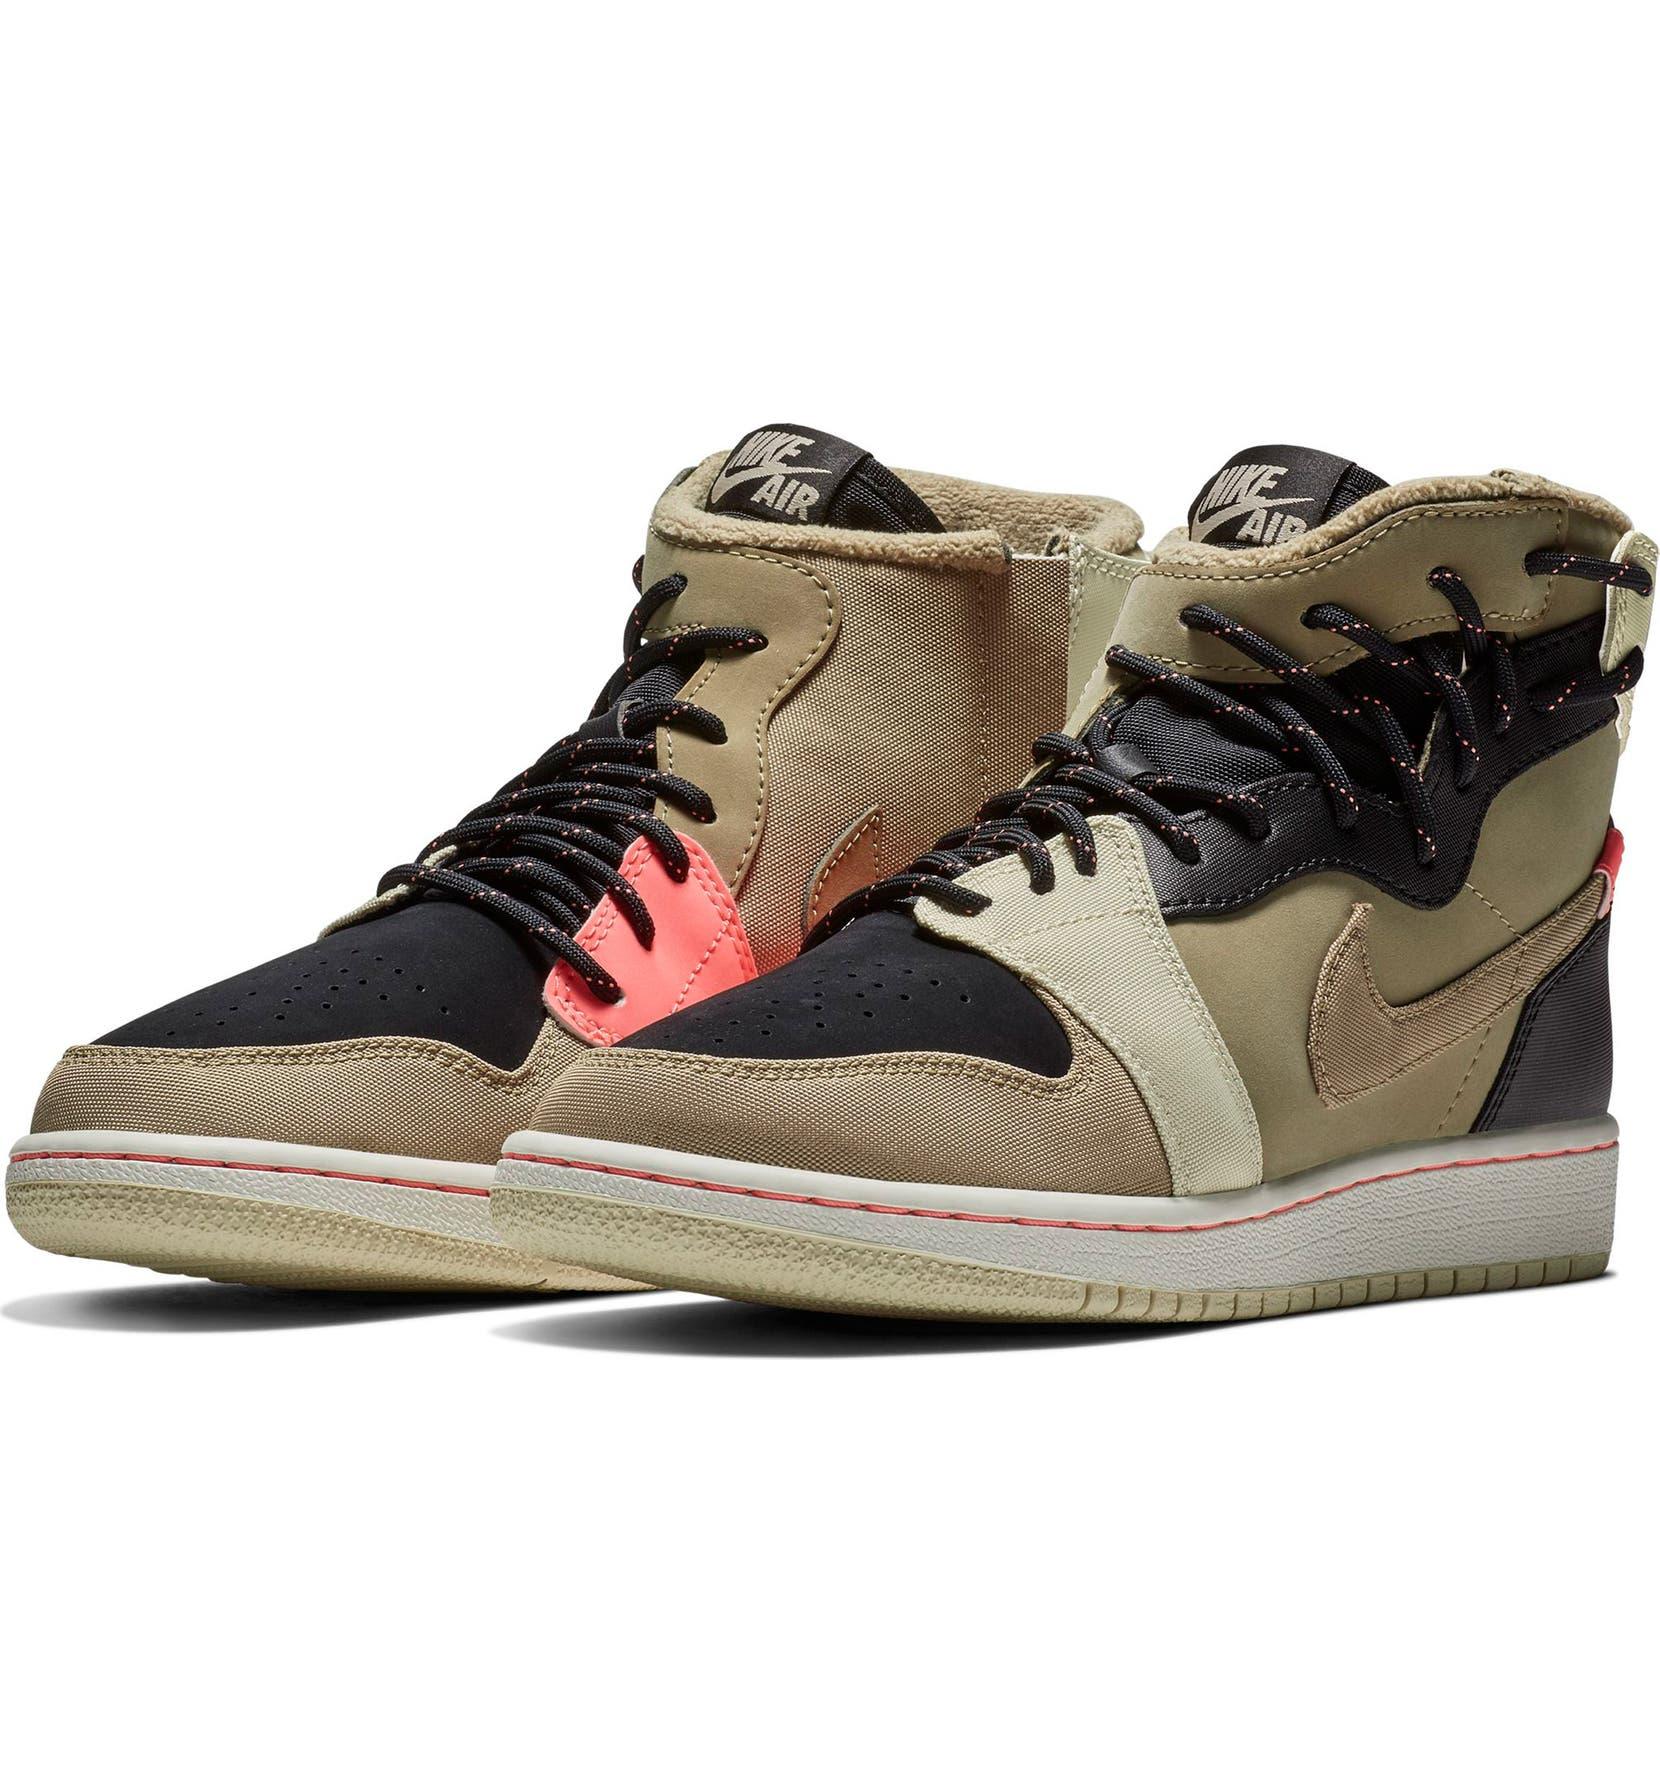 100% authentic c9890 4d6b0 Nike Air Jordan 1 Rebel XX Utility High Top Sneaker (Women)   Nordstrom